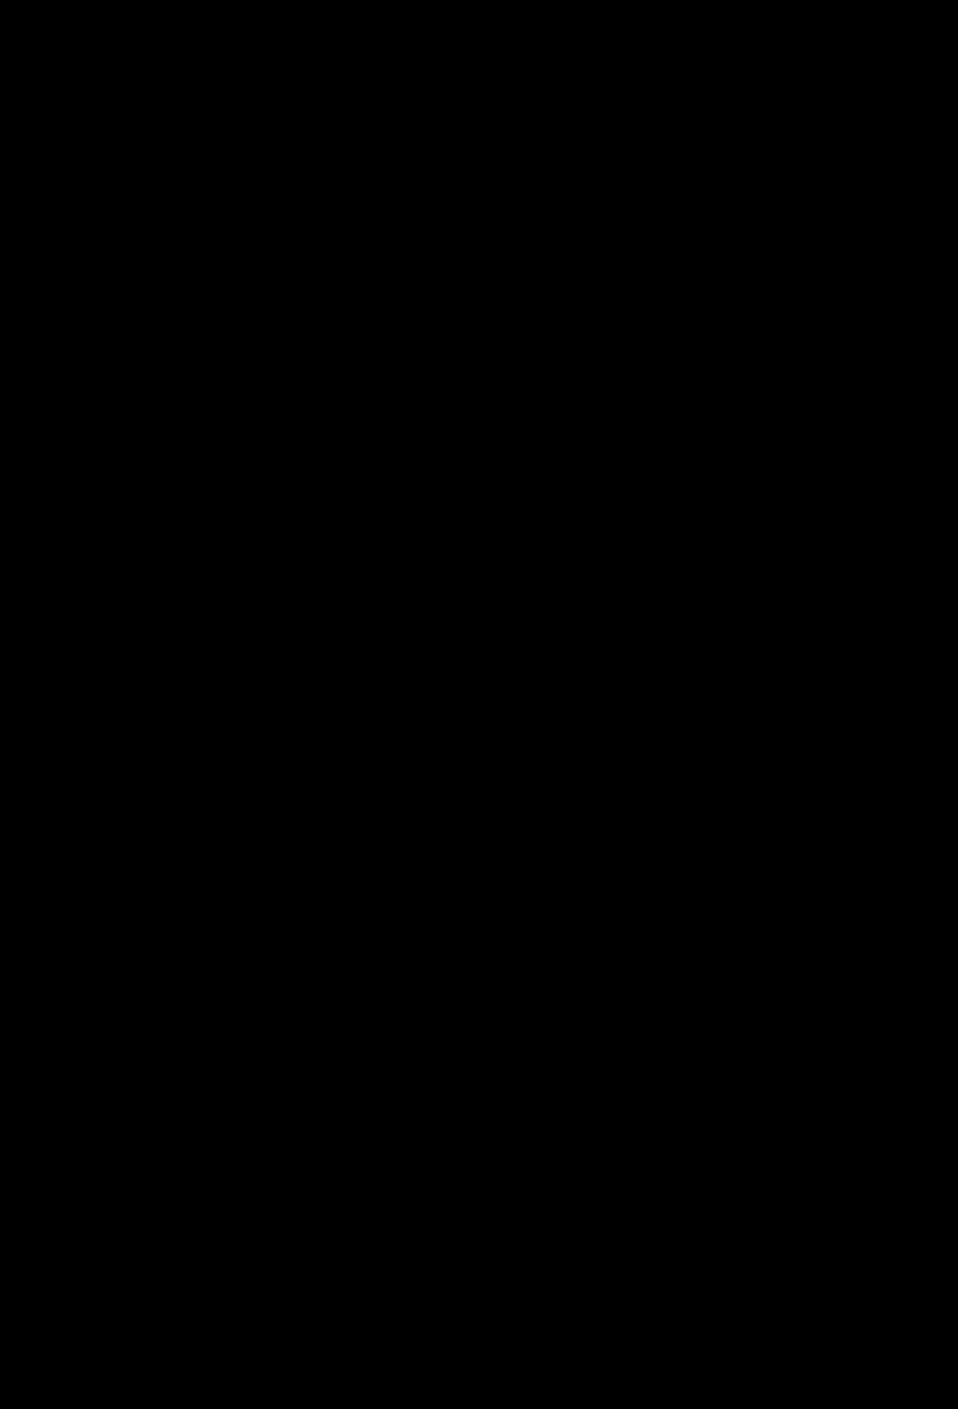 Karate clipart black and white. Public domain clip art